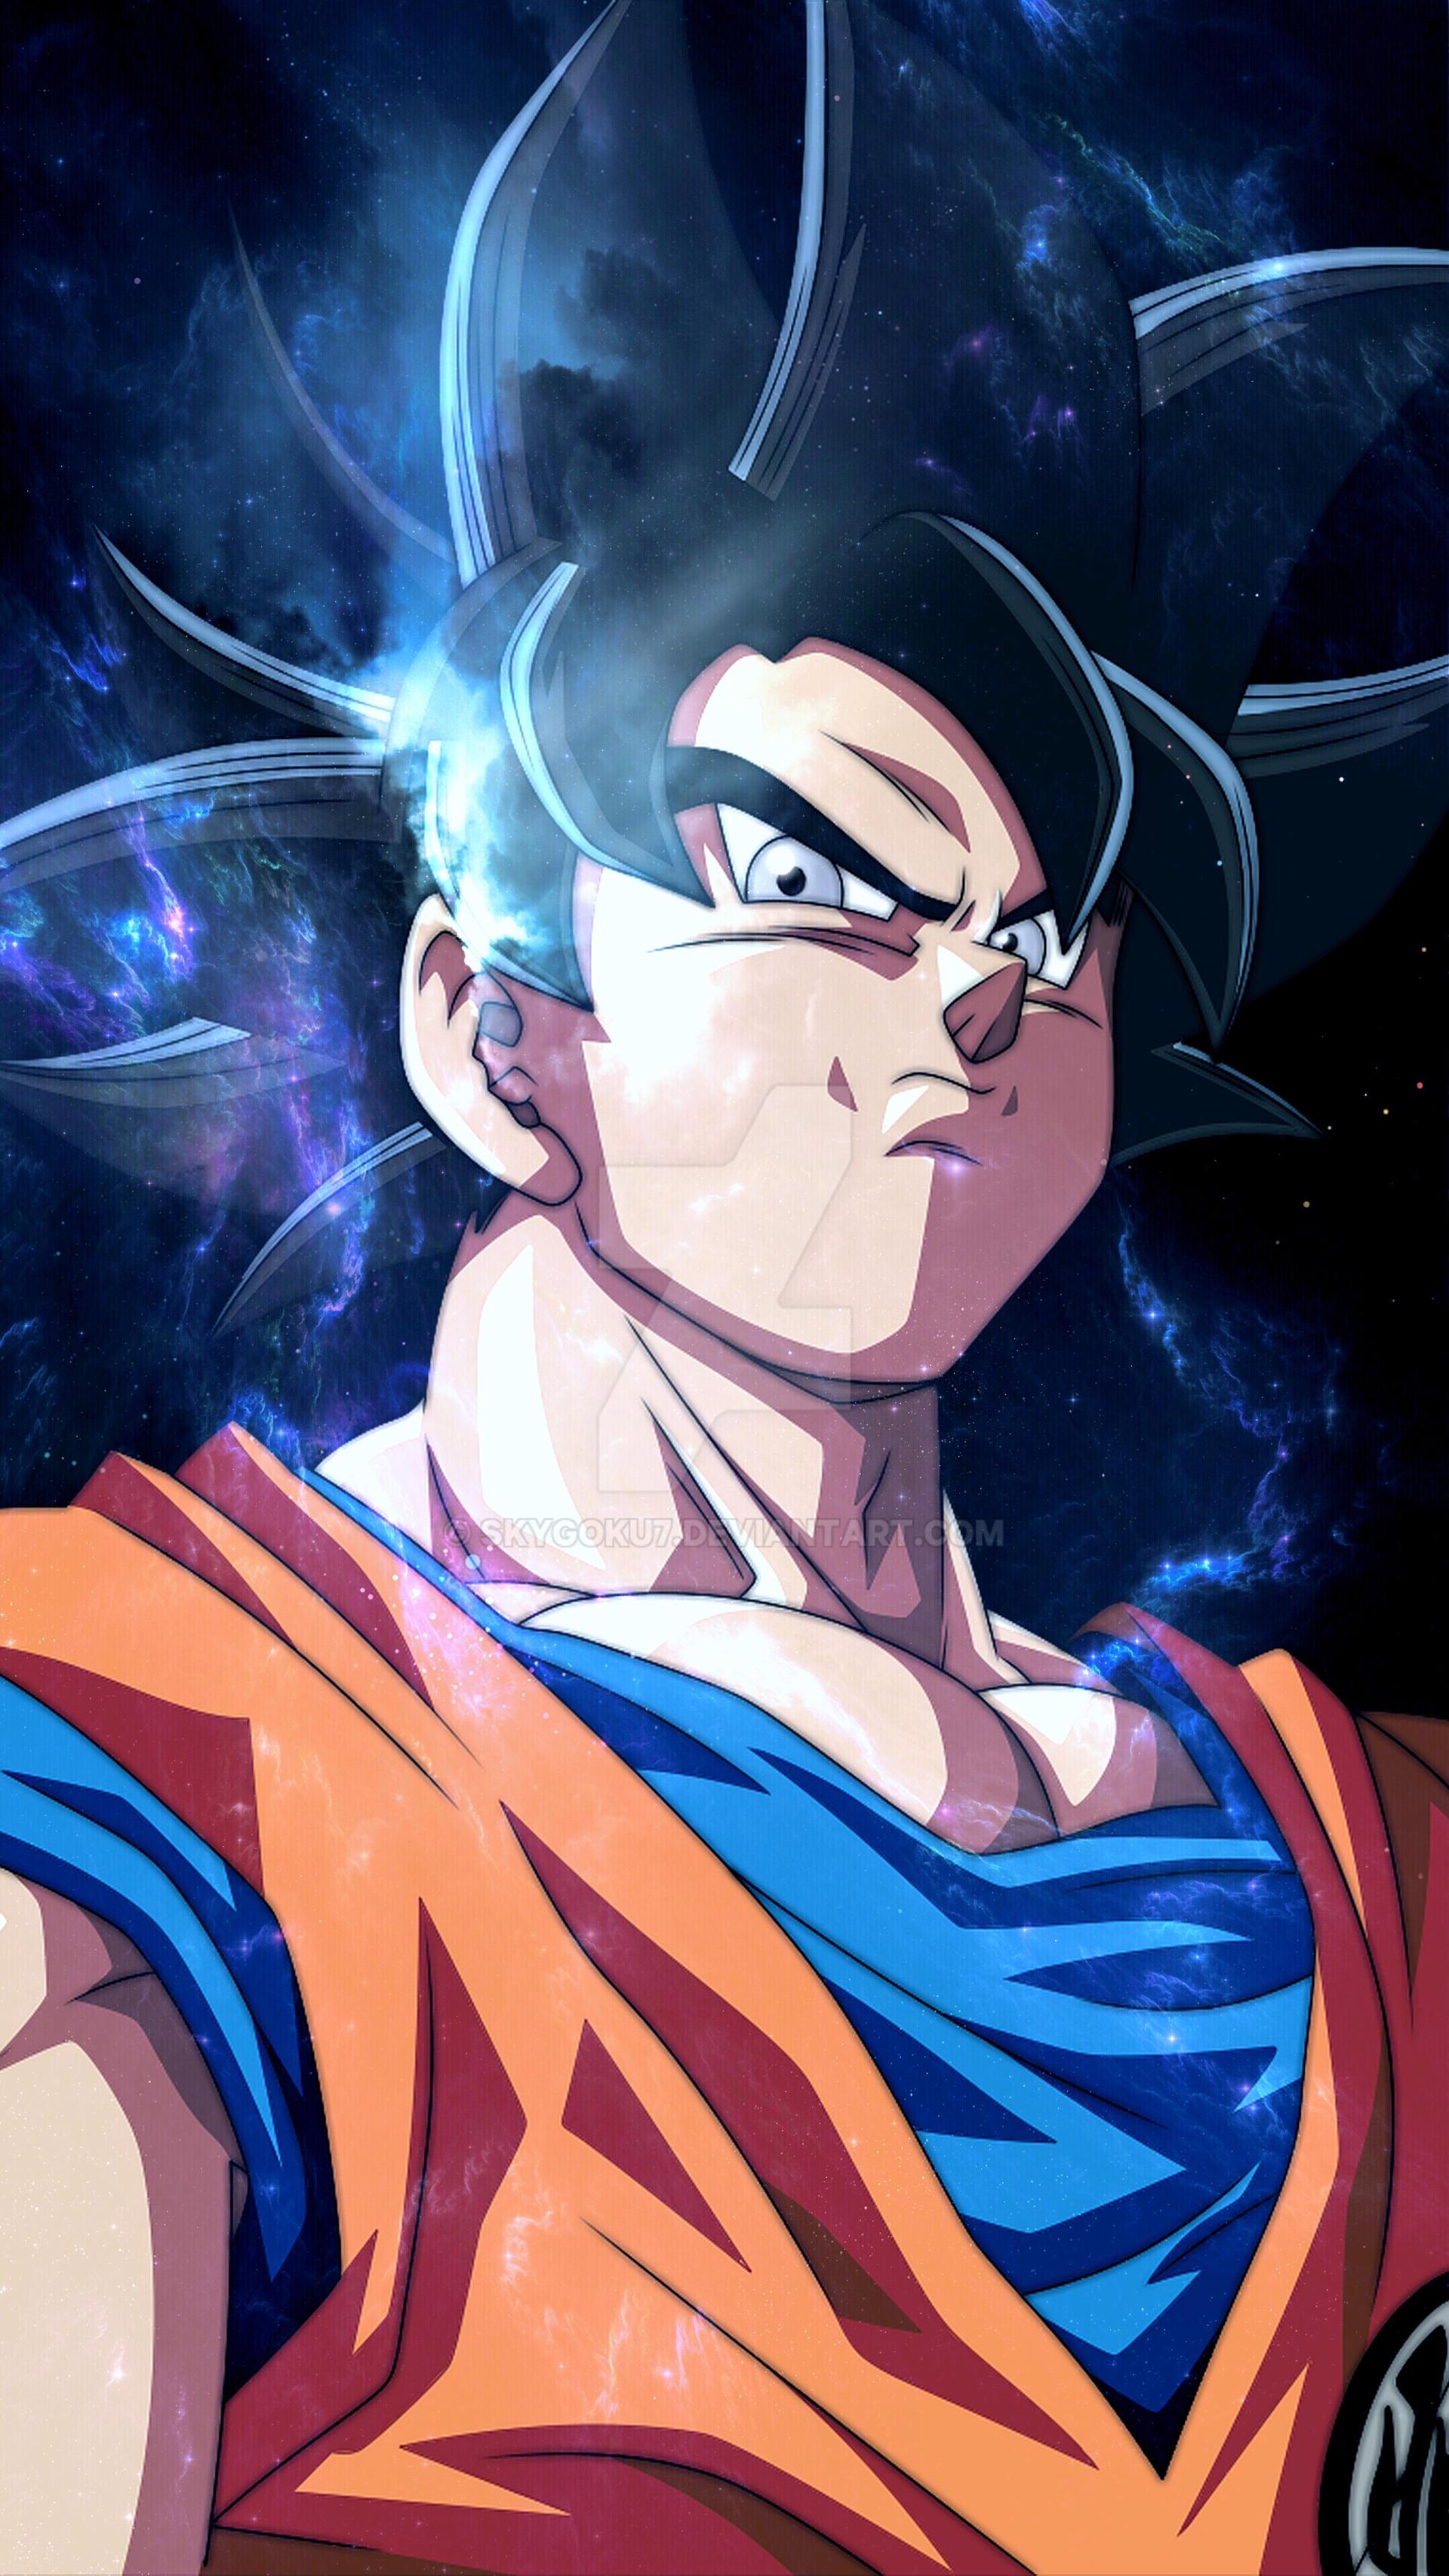 Goku Ultra Instinct Wallpaper edit by